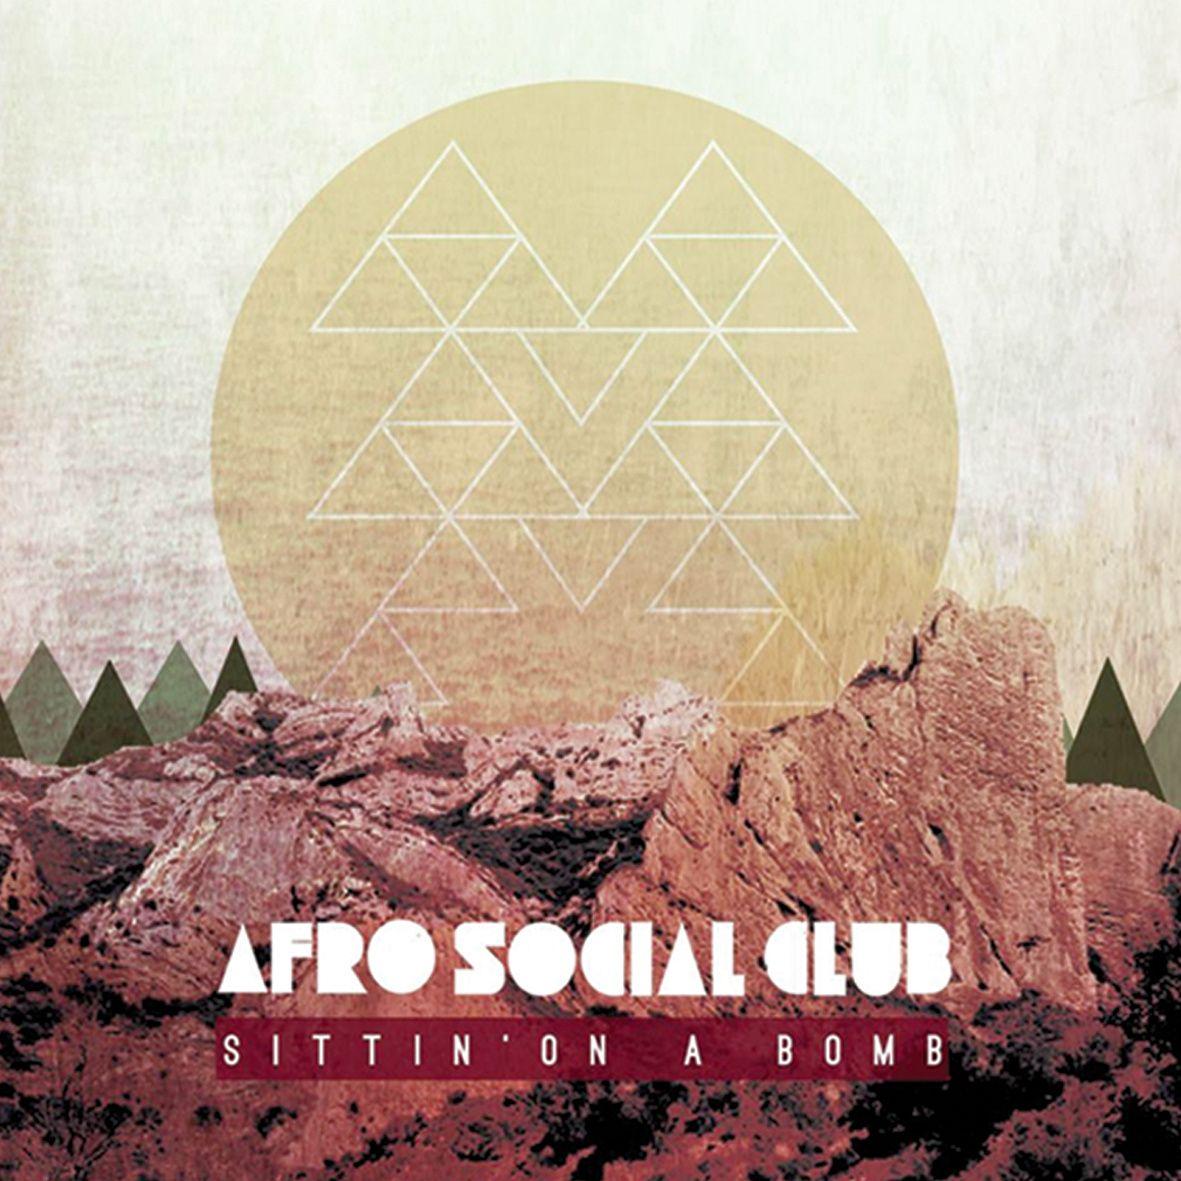 Sittin' On A Bomb, by AFRO SOCIAL CLUB Social club